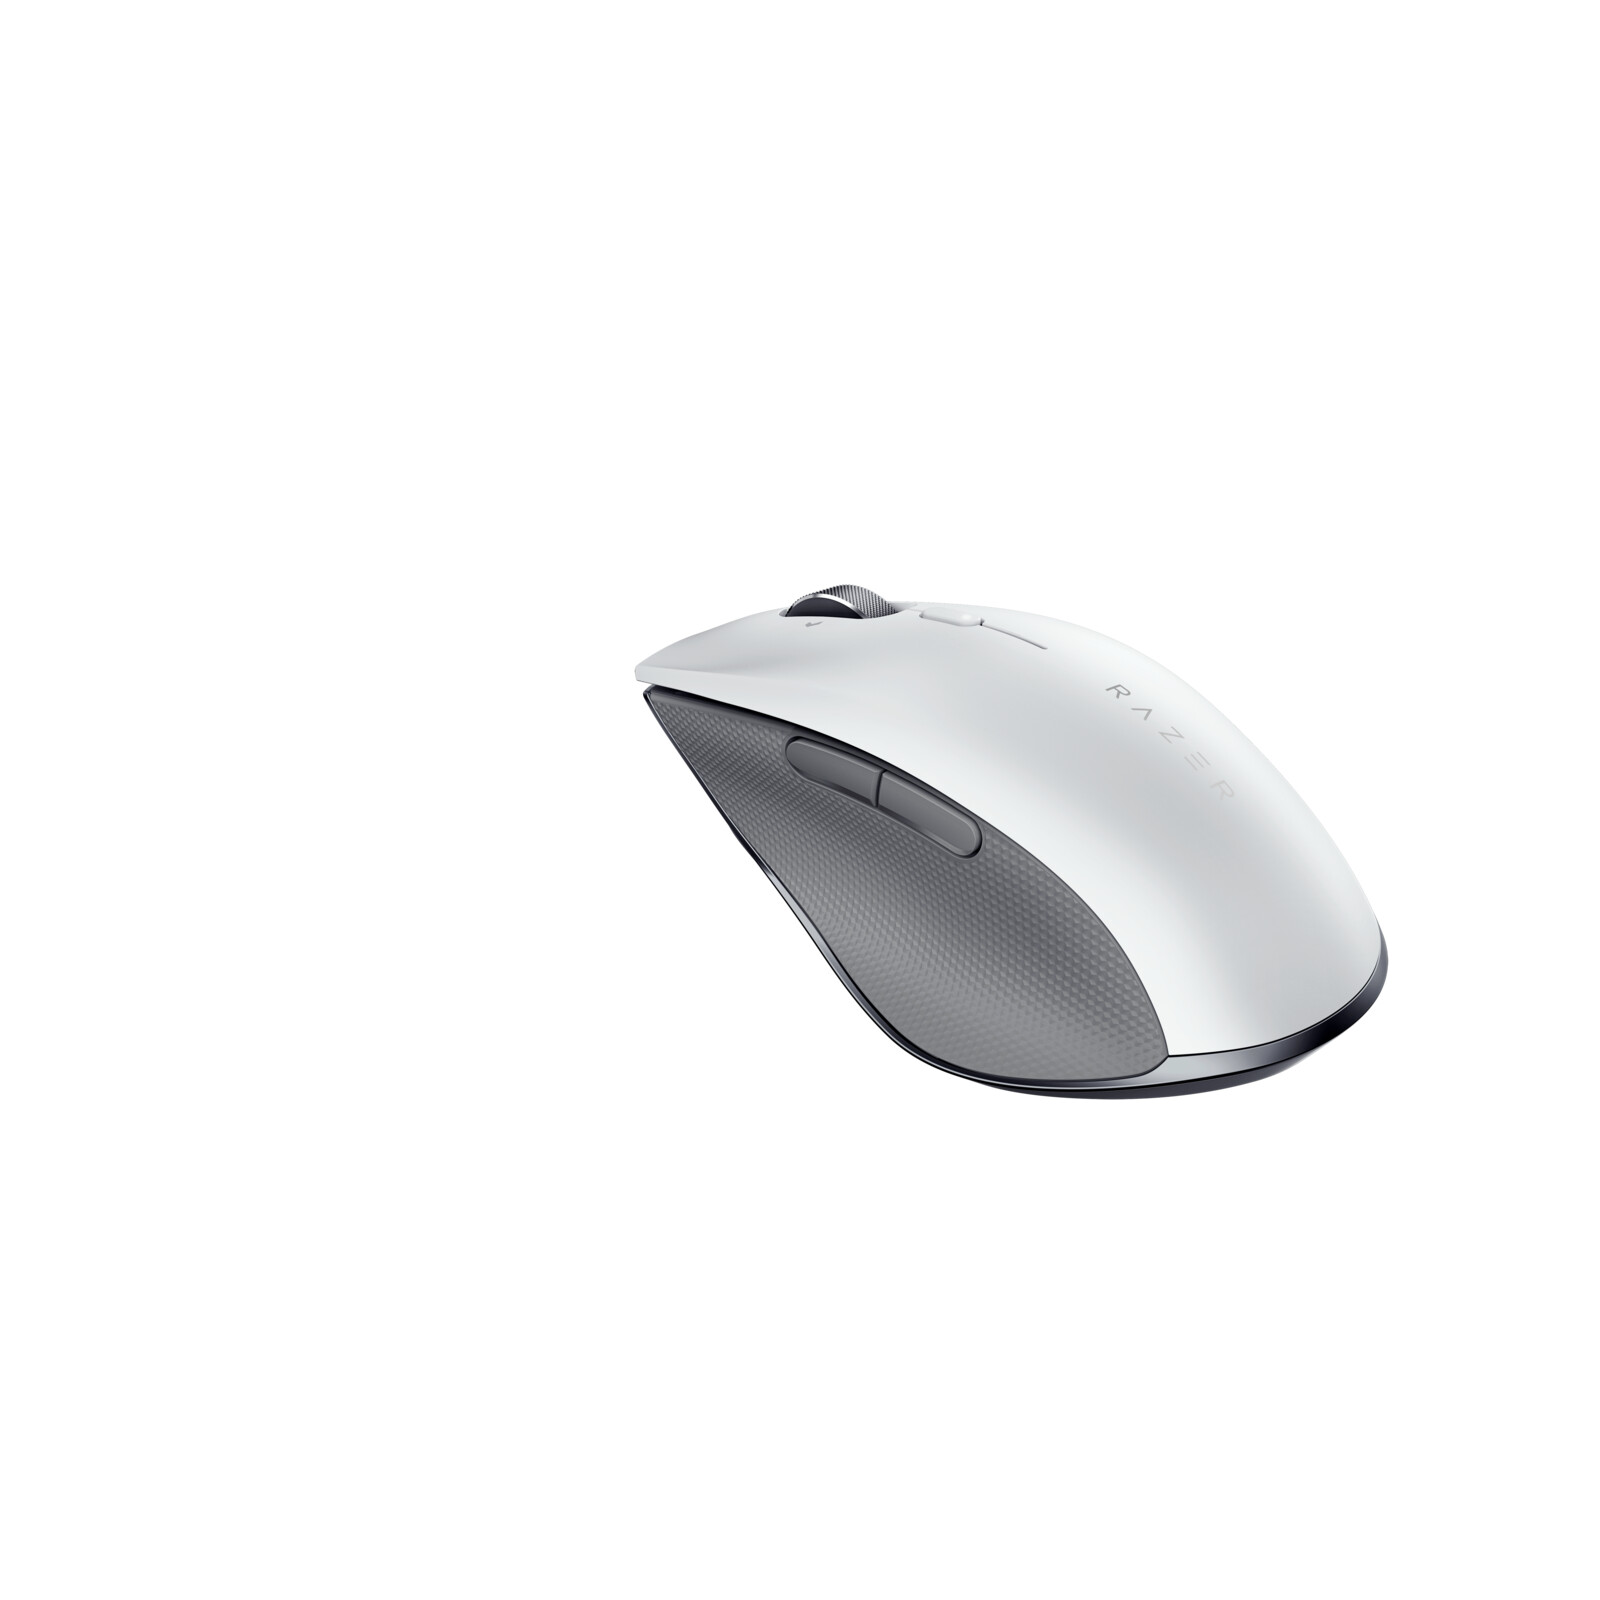 Razer Pro Click - Ergonomische Wireless Mouse